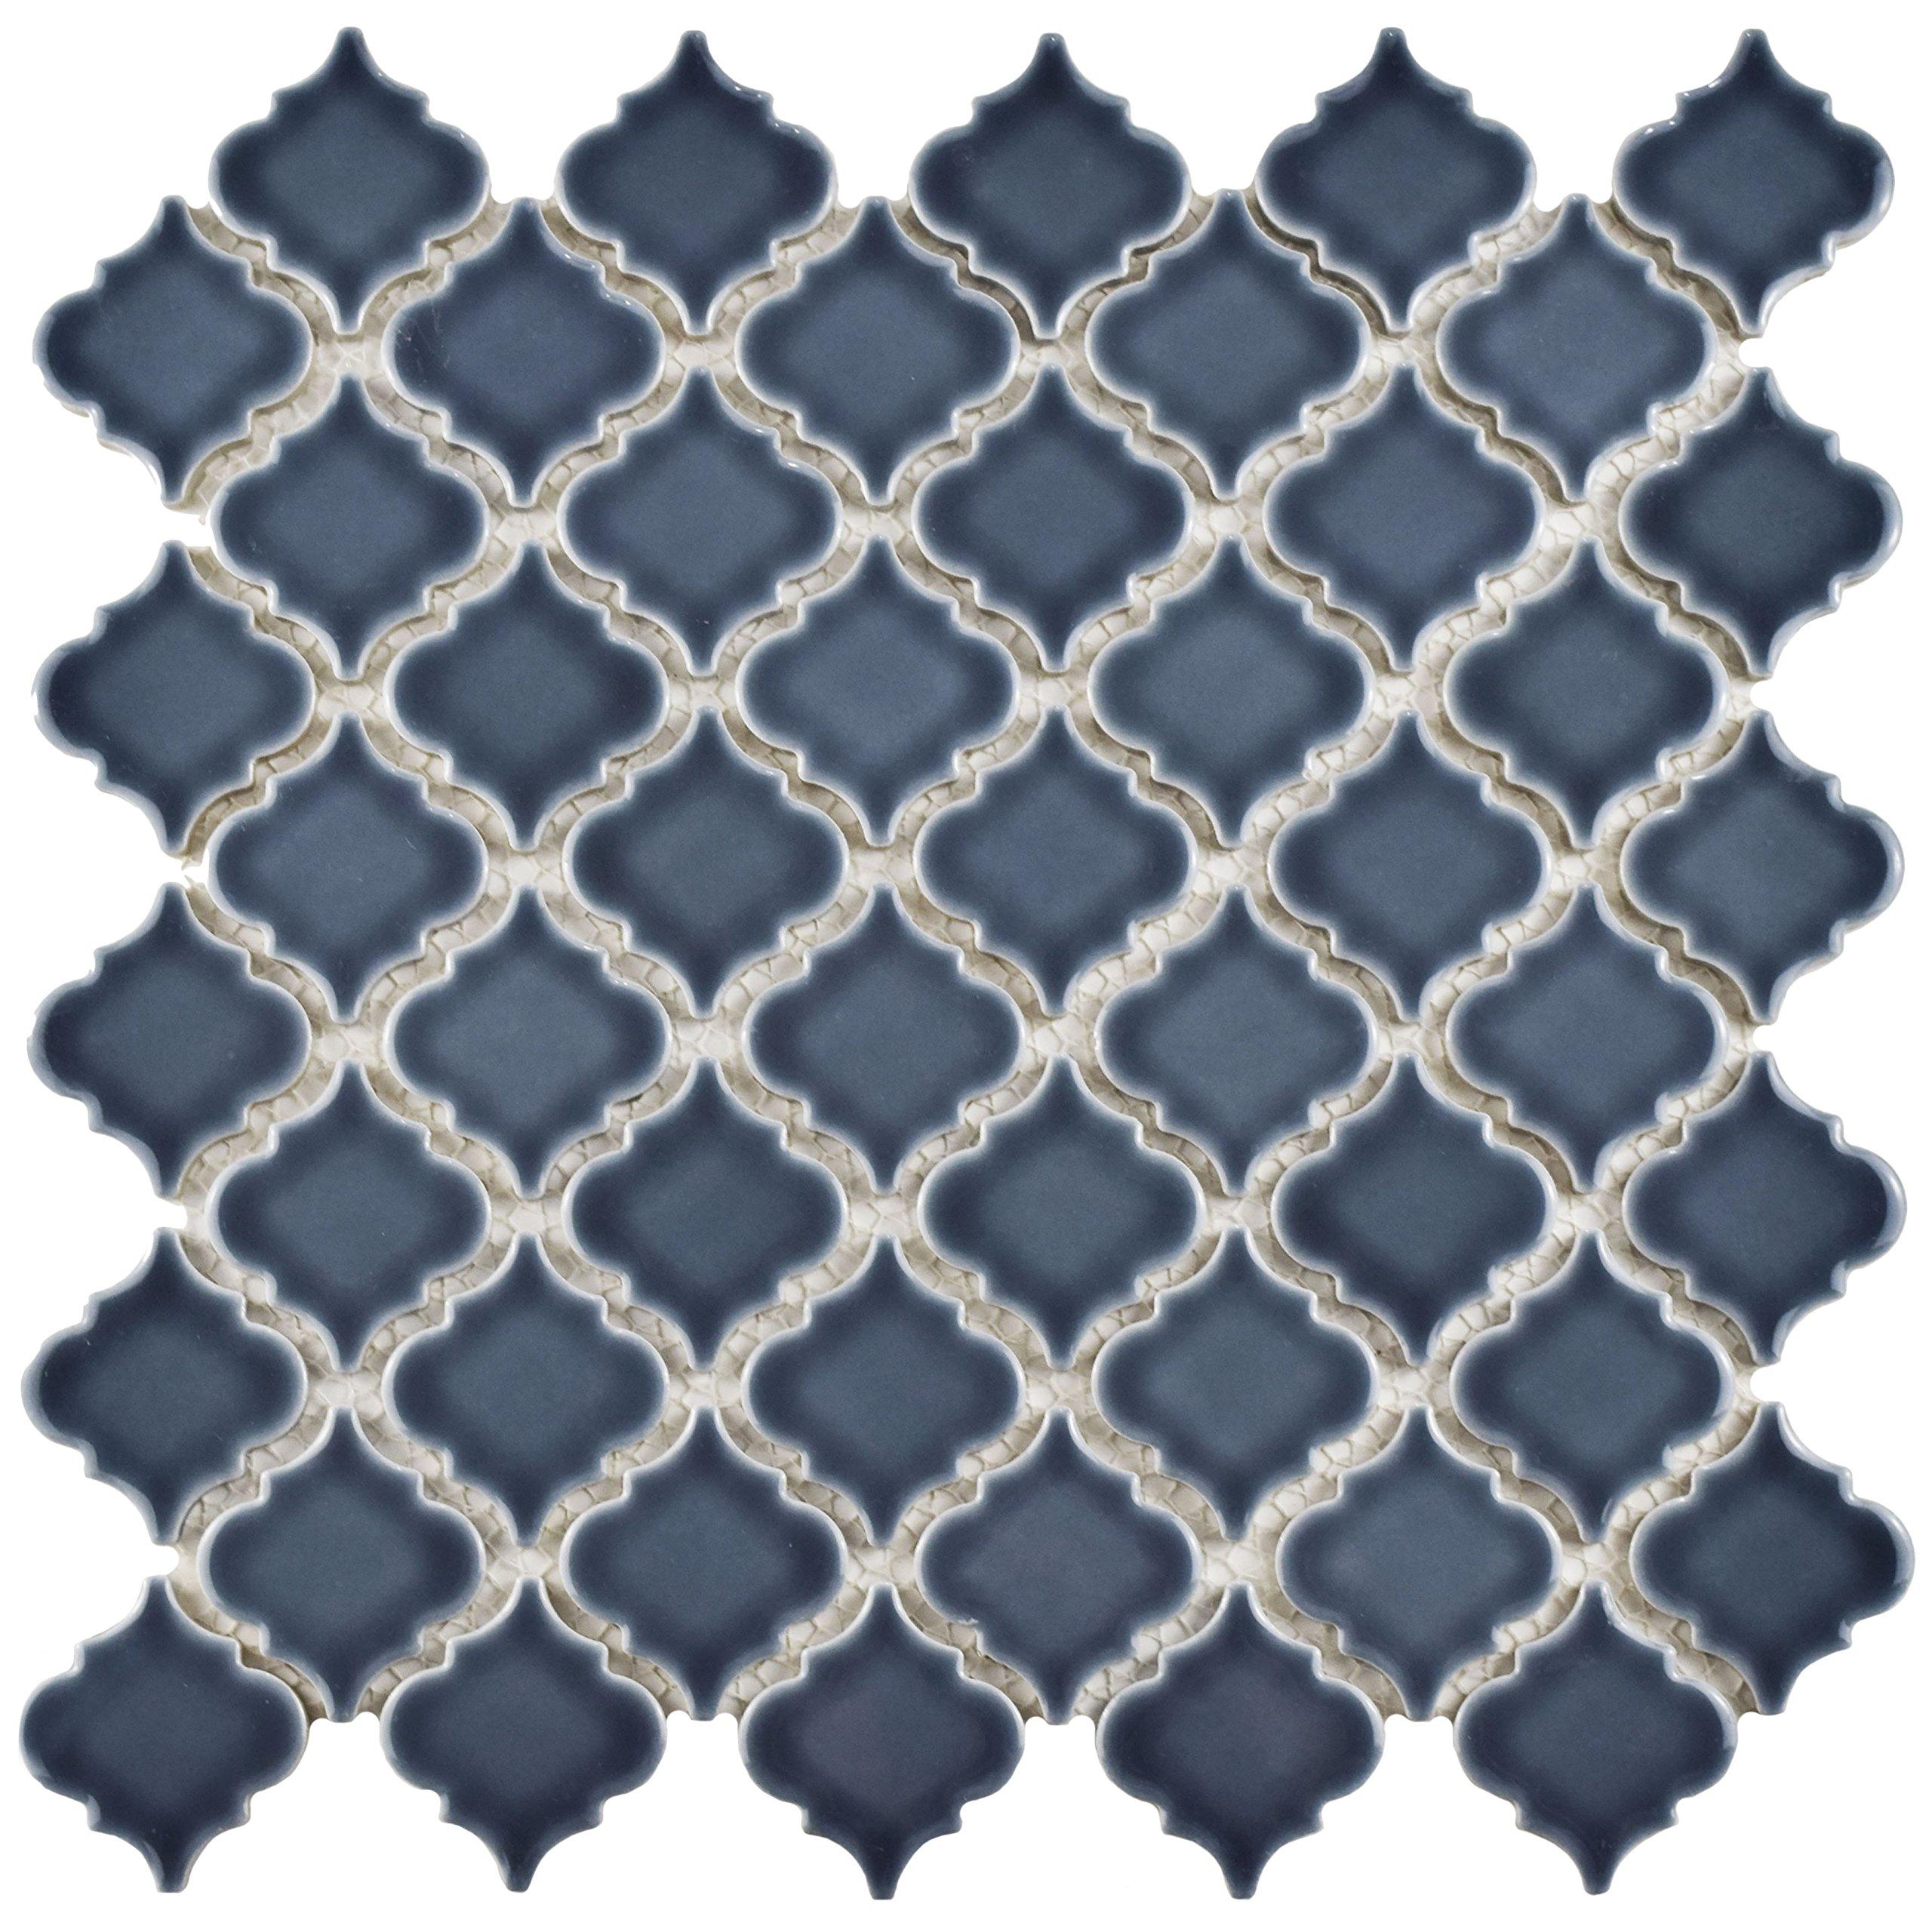 SomerTile FKOLTR86 Tinge Porcelain Mosaic Floor & Wall Tile, 12.375'' x 12.5'', Storm Grey,,, Blue by SOMERTILE